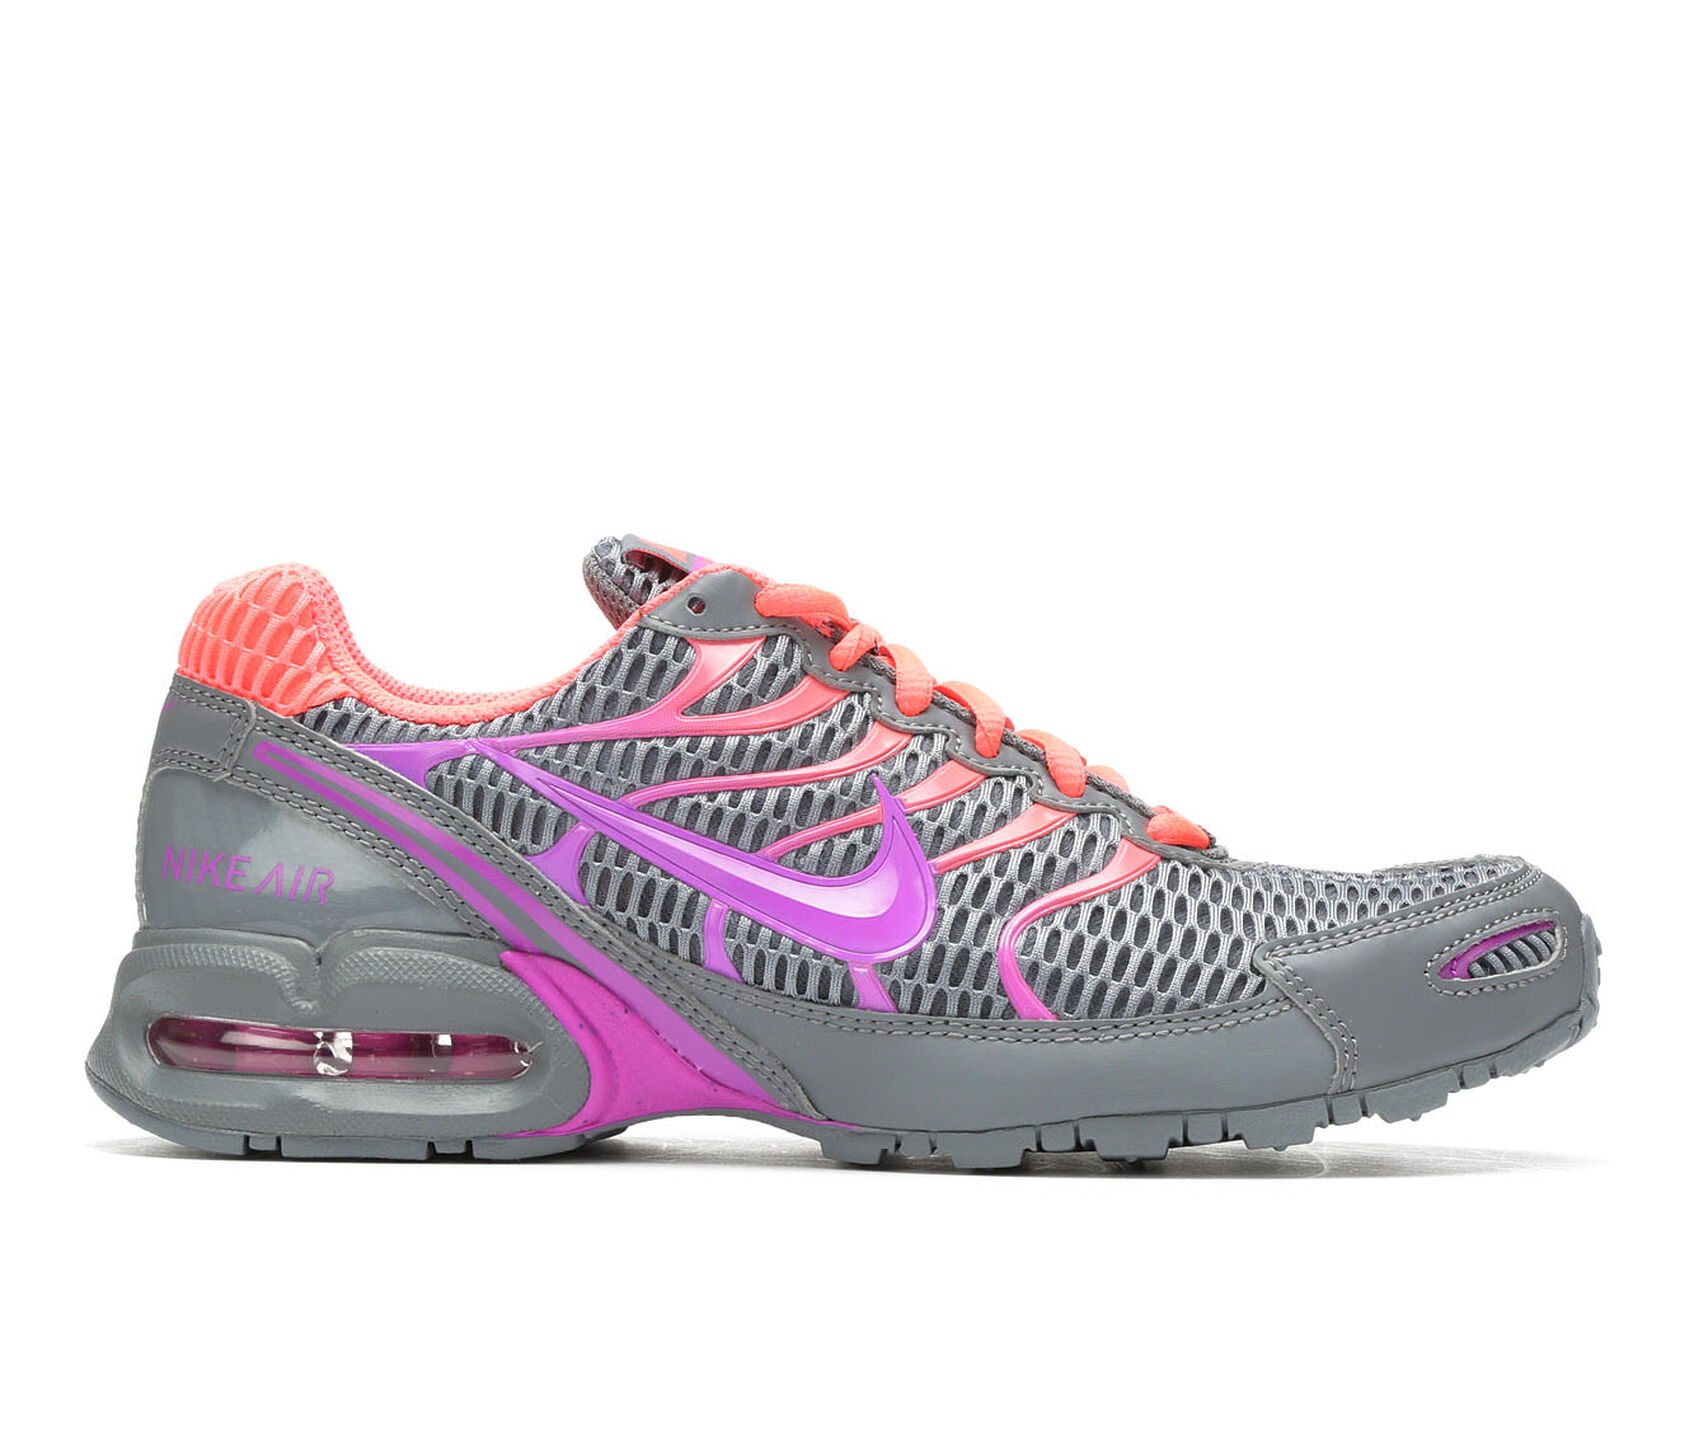 bafd62561ee29b ... Nike Air Max Torch 4 Running Shoes. Previous